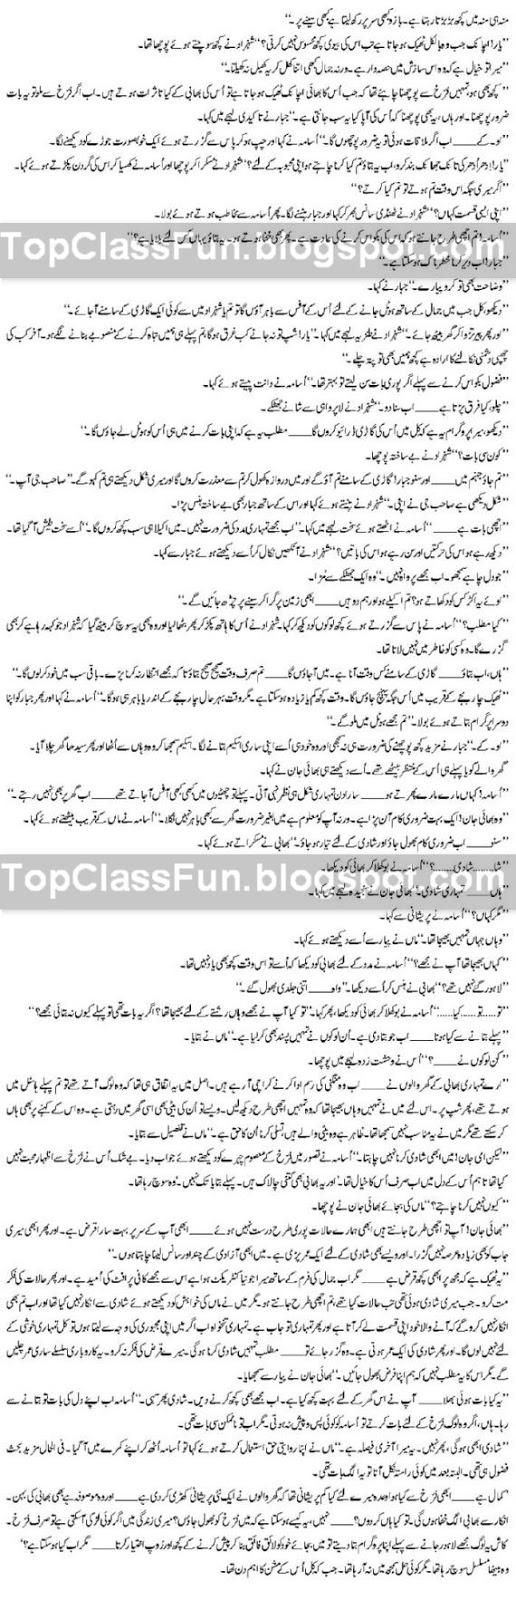 Romantic Urdu Novel - MOHABBAT – By Shahina Chanda Mehtab Page 15